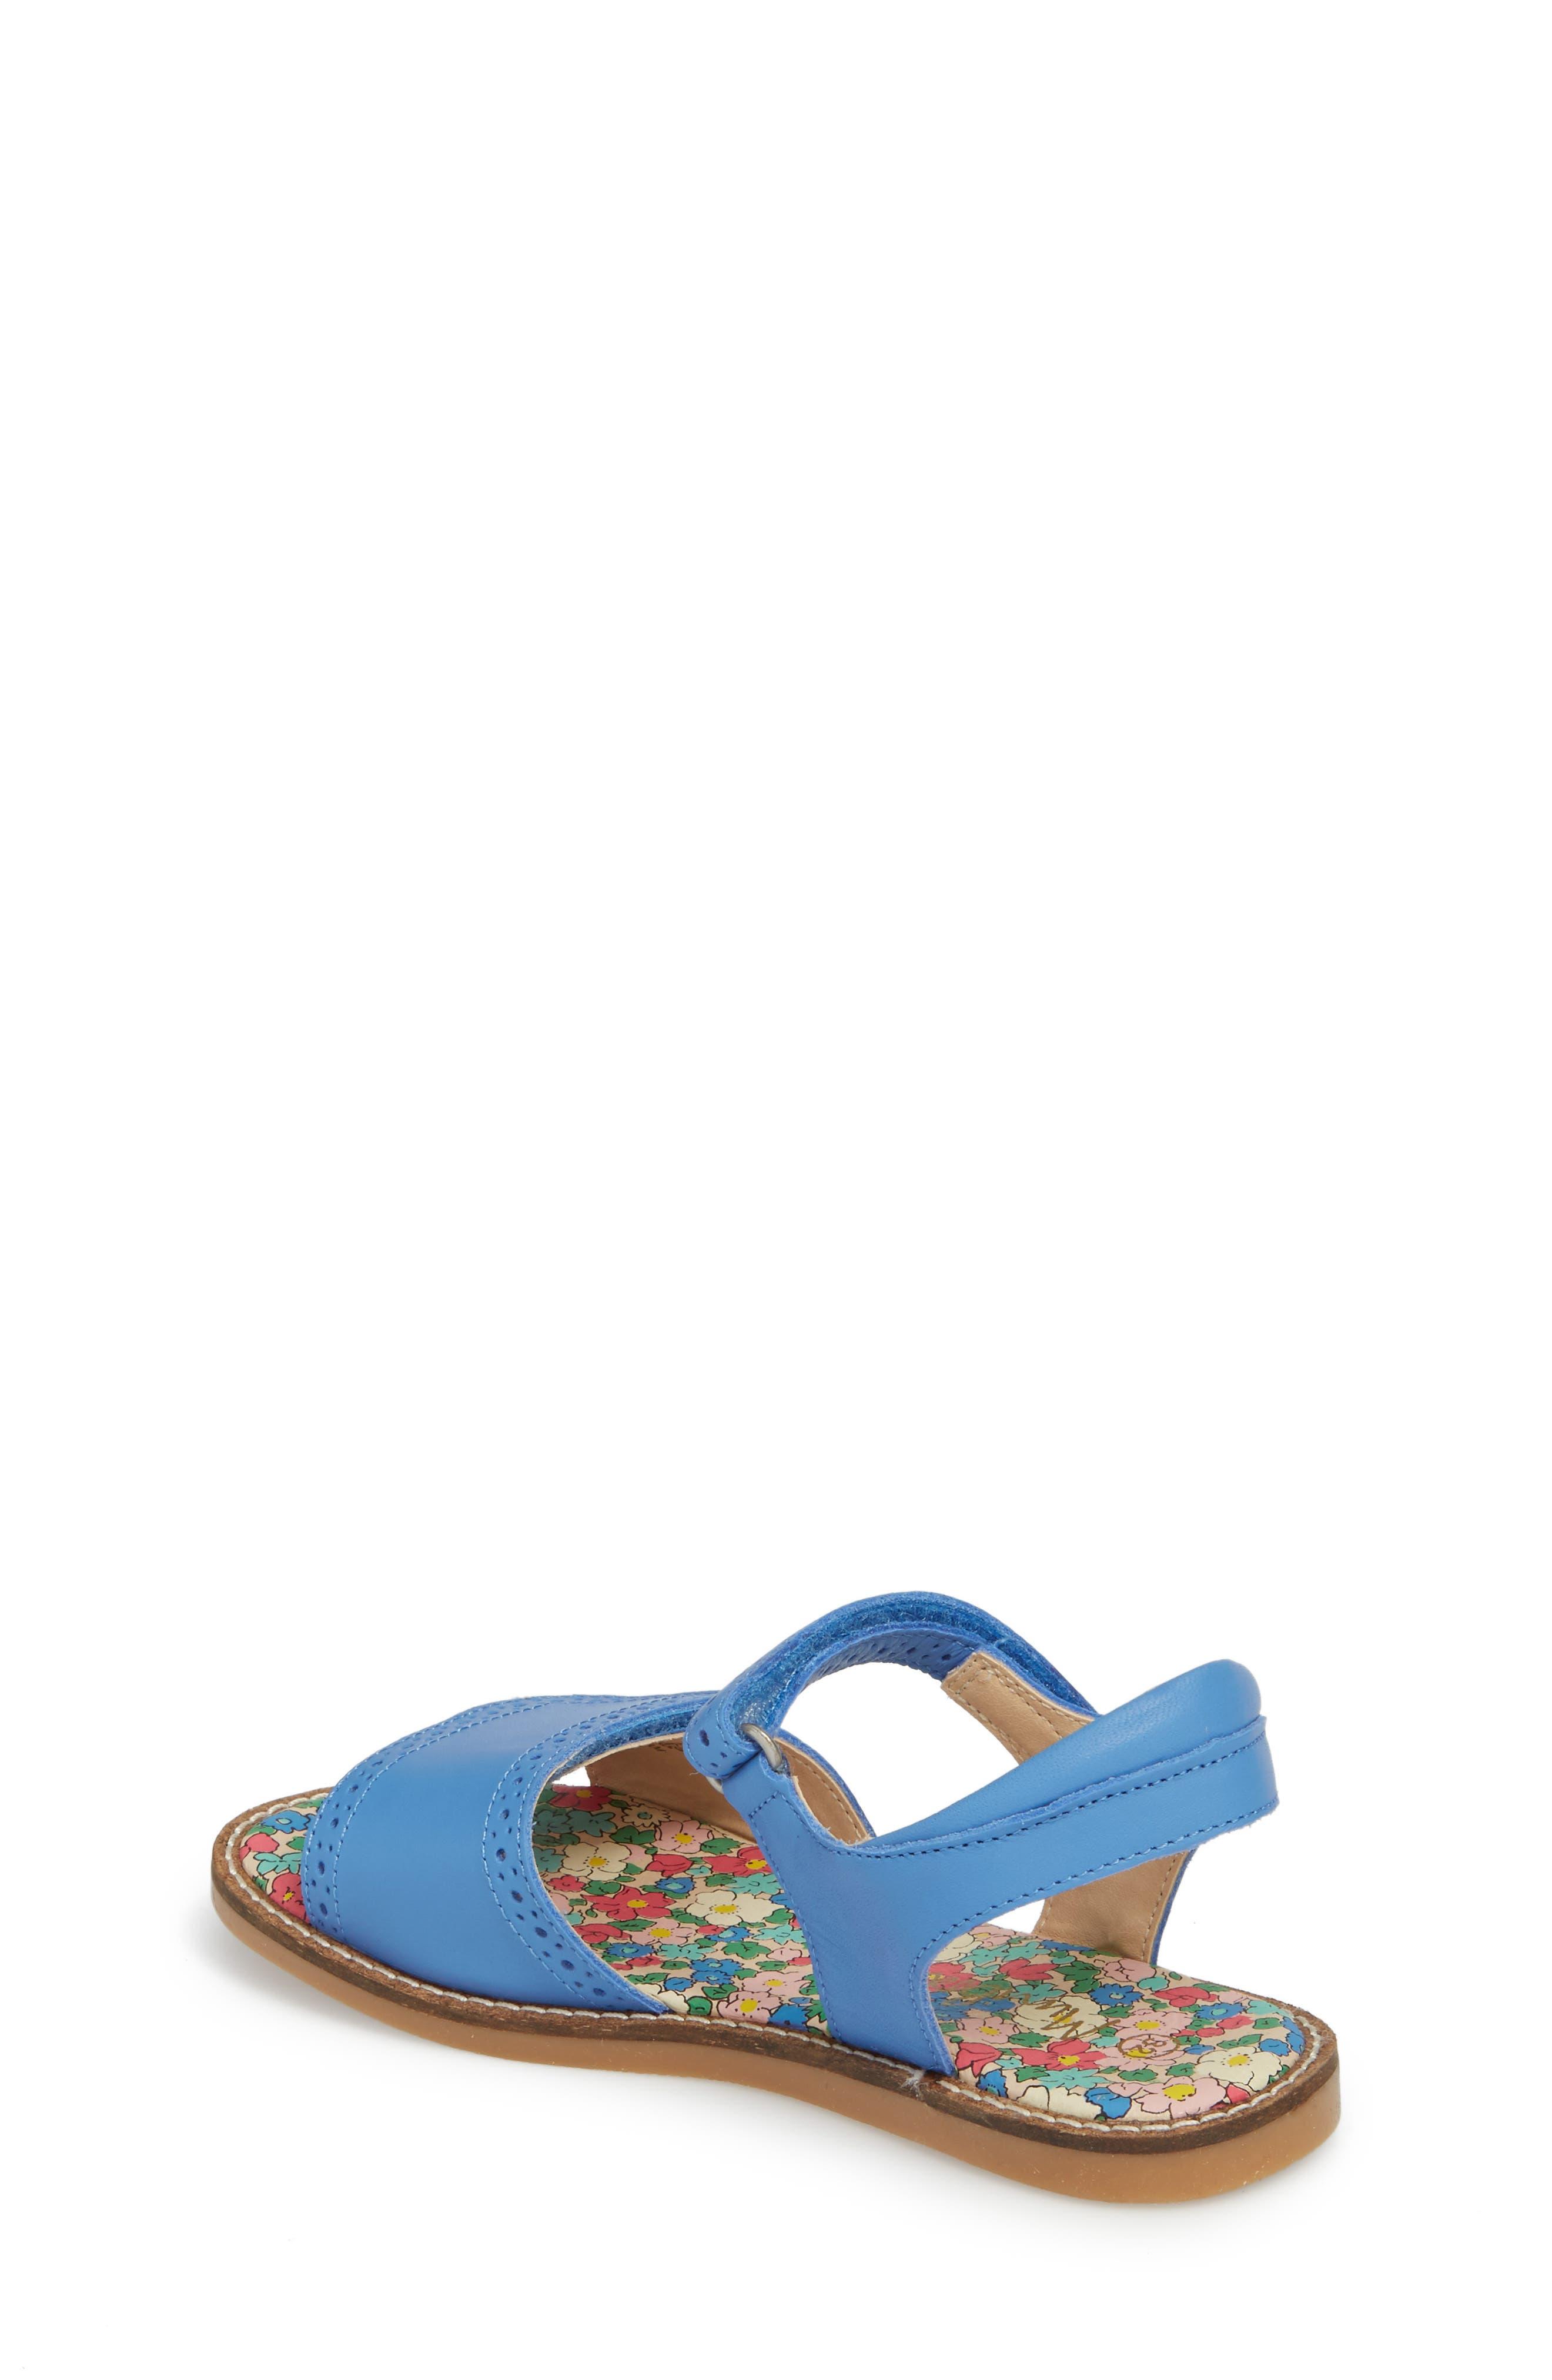 Adjustable Quarter Strap Sandal,                             Alternate thumbnail 2, color,                             Penzance Blue